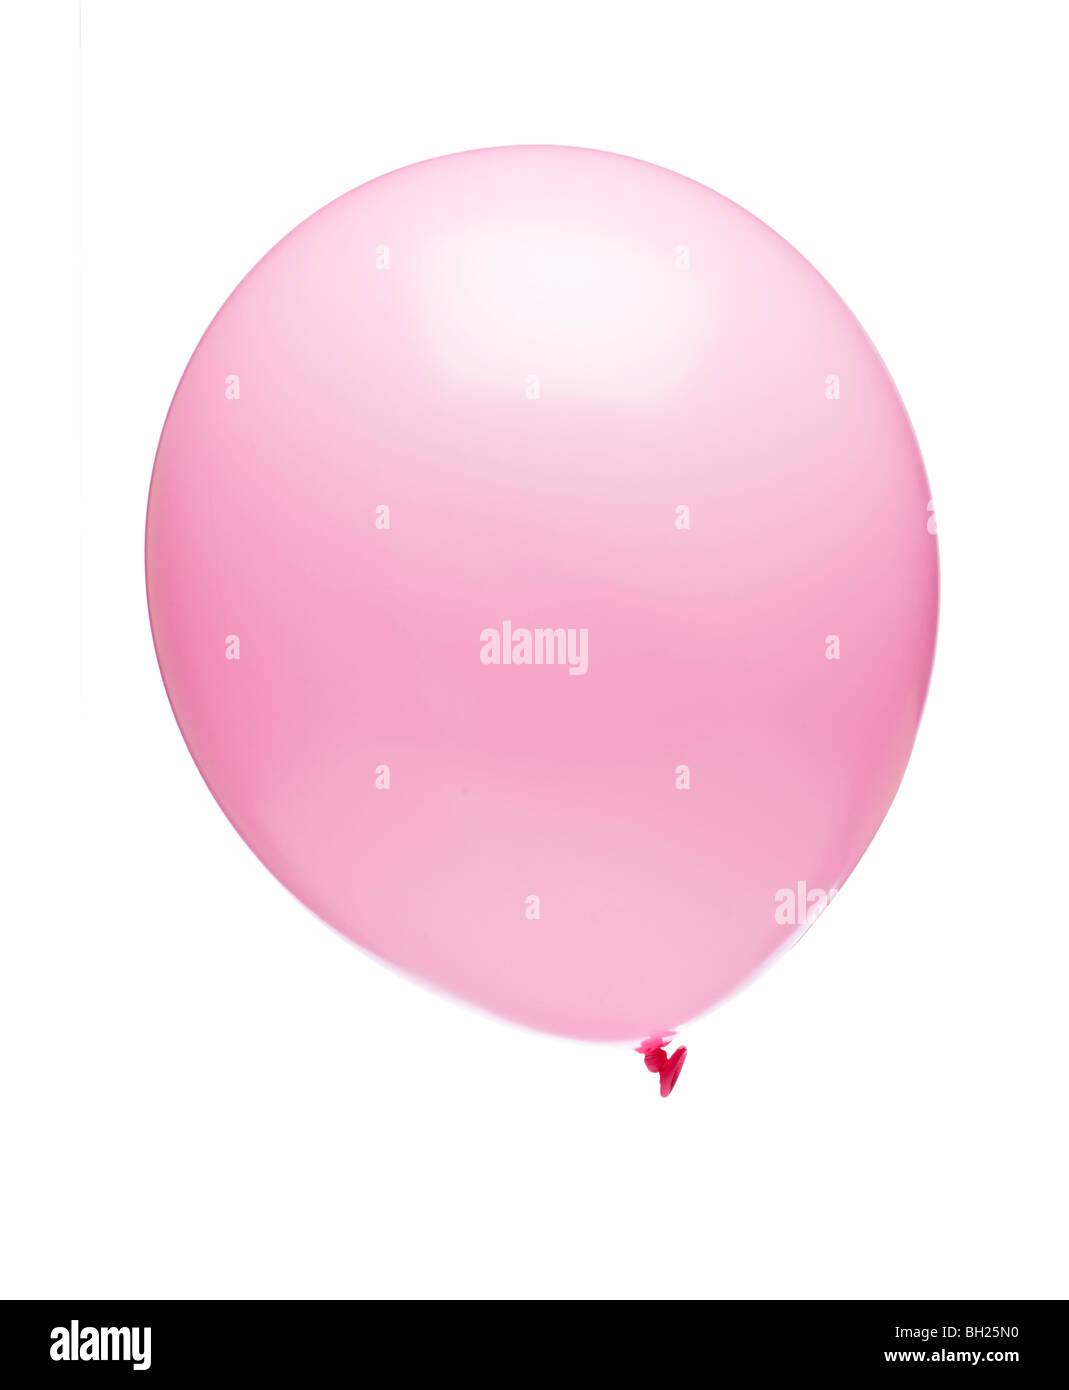 Palloncino rosa su sfondo bianco Foto Stock